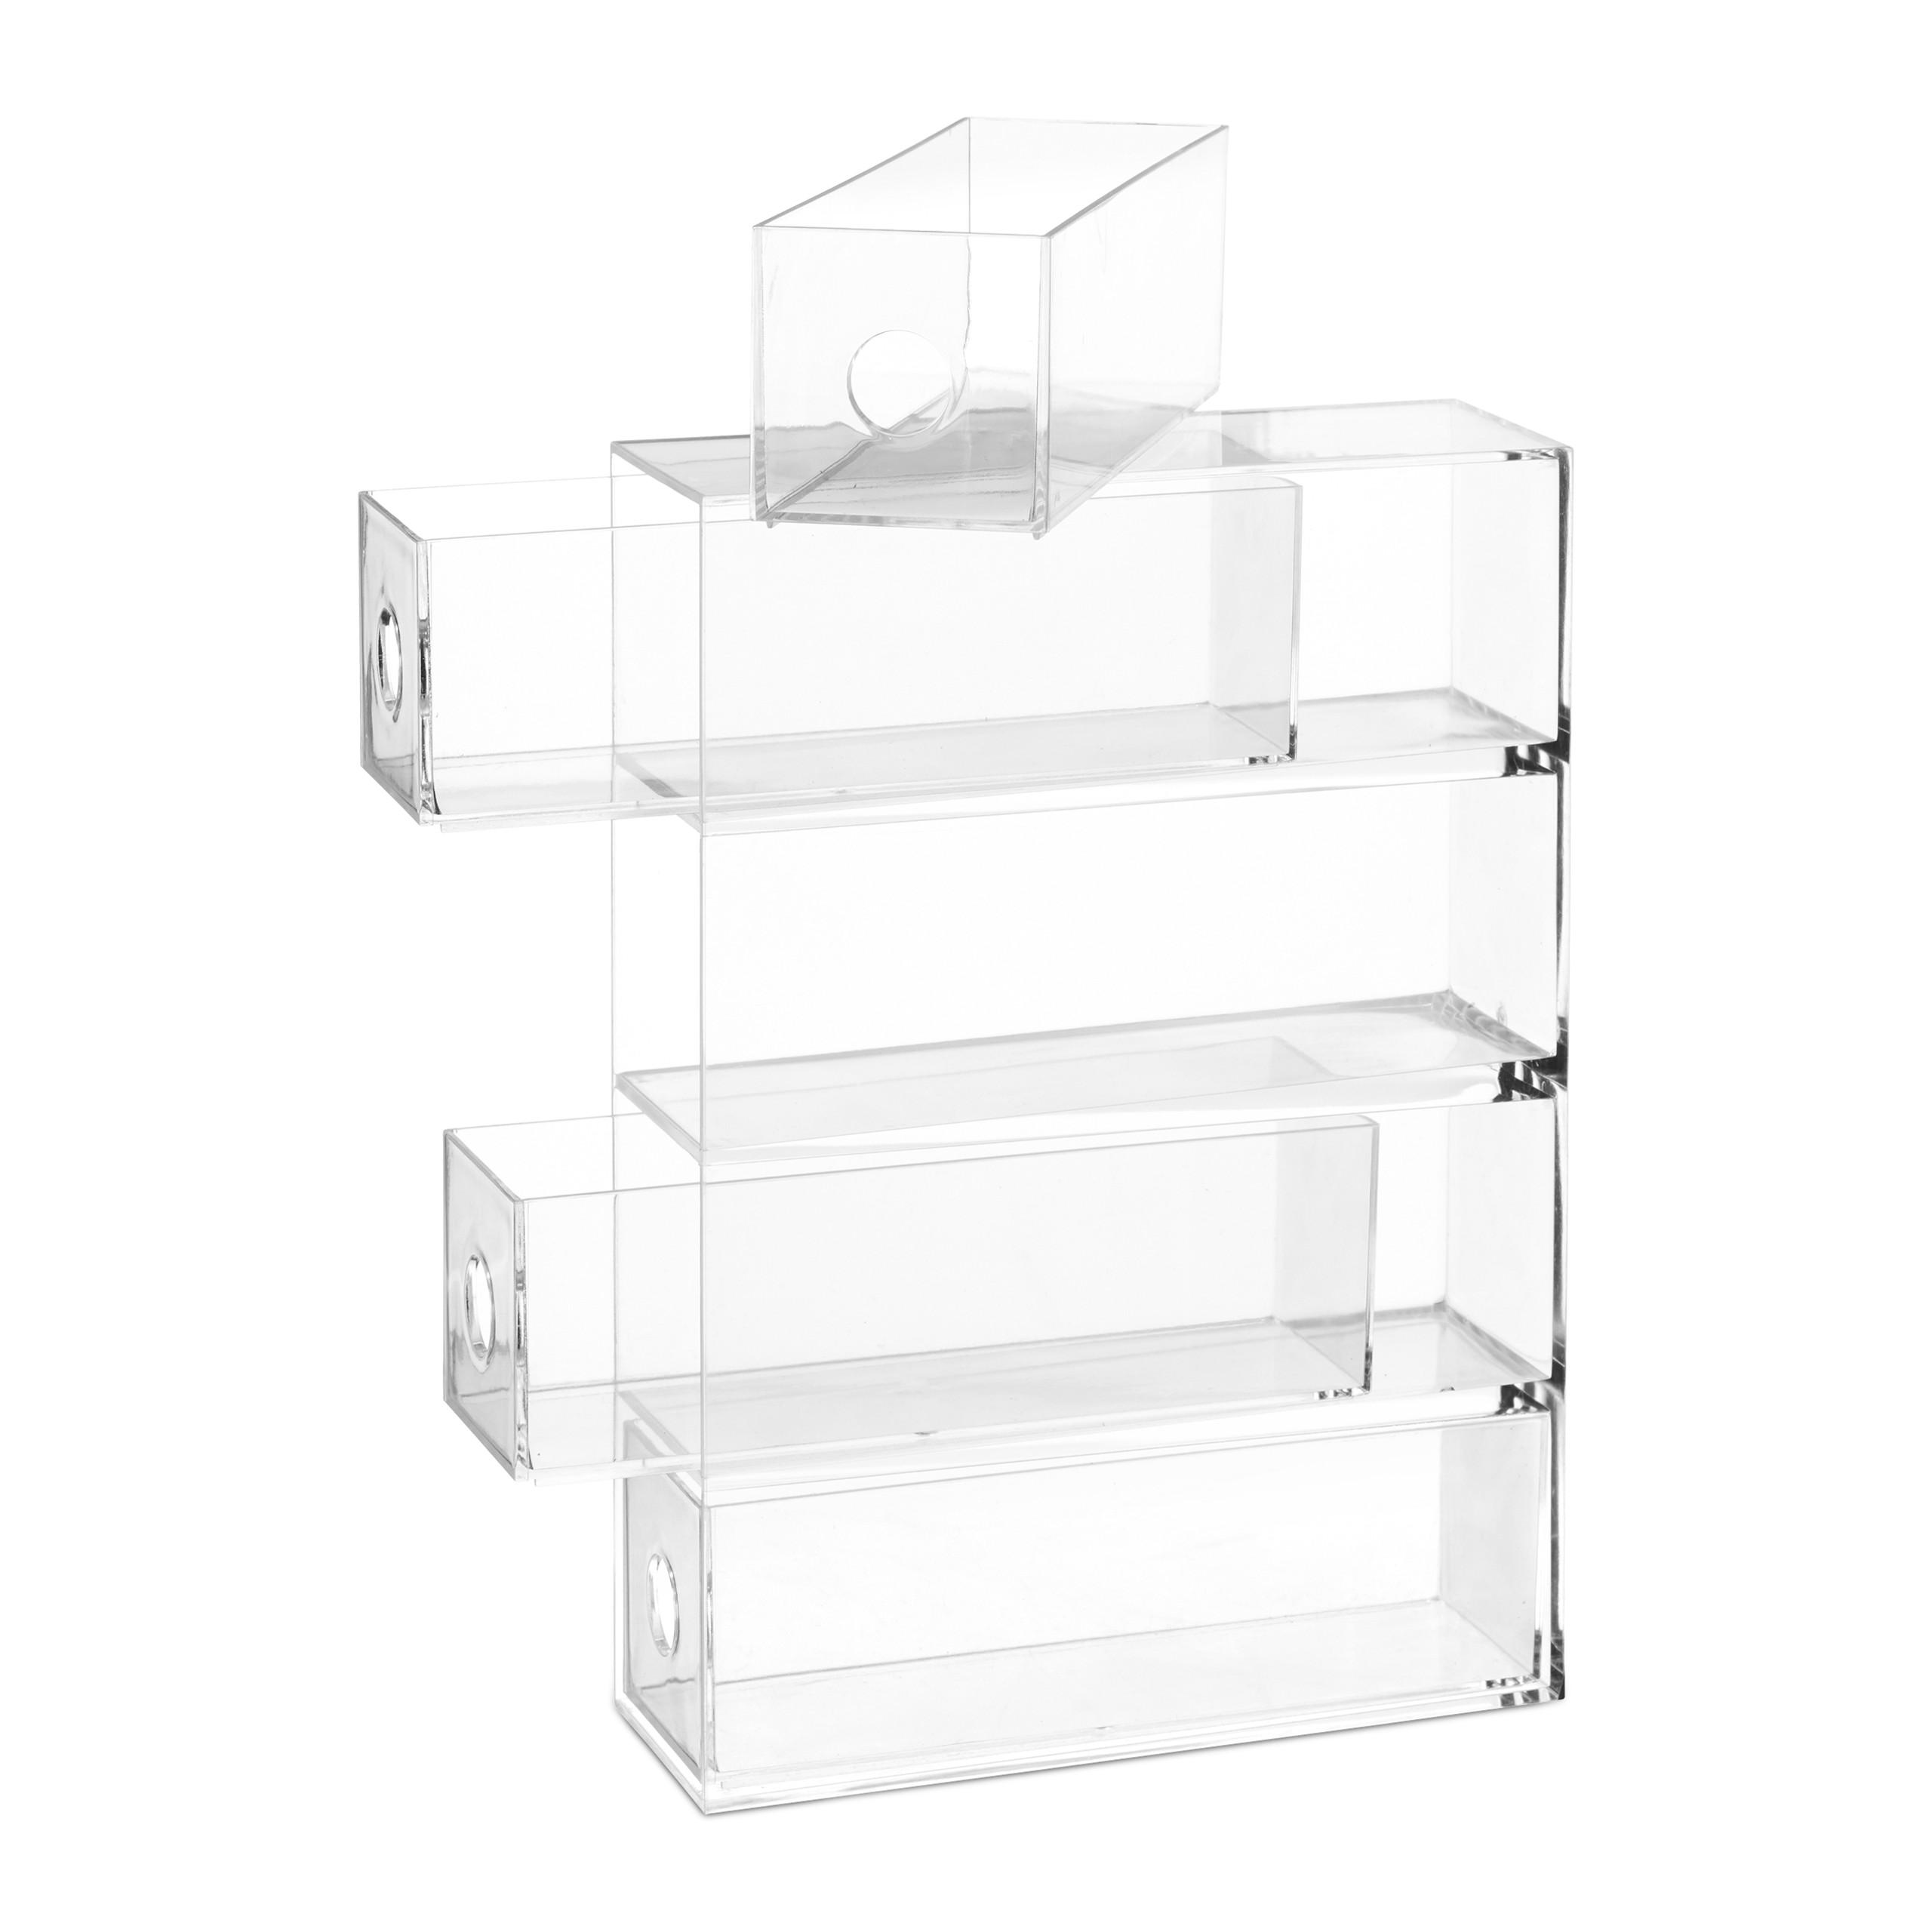 Transparent-Make-Up-Organiser-Storage-Box-with-4-Drawers thumbnail 9